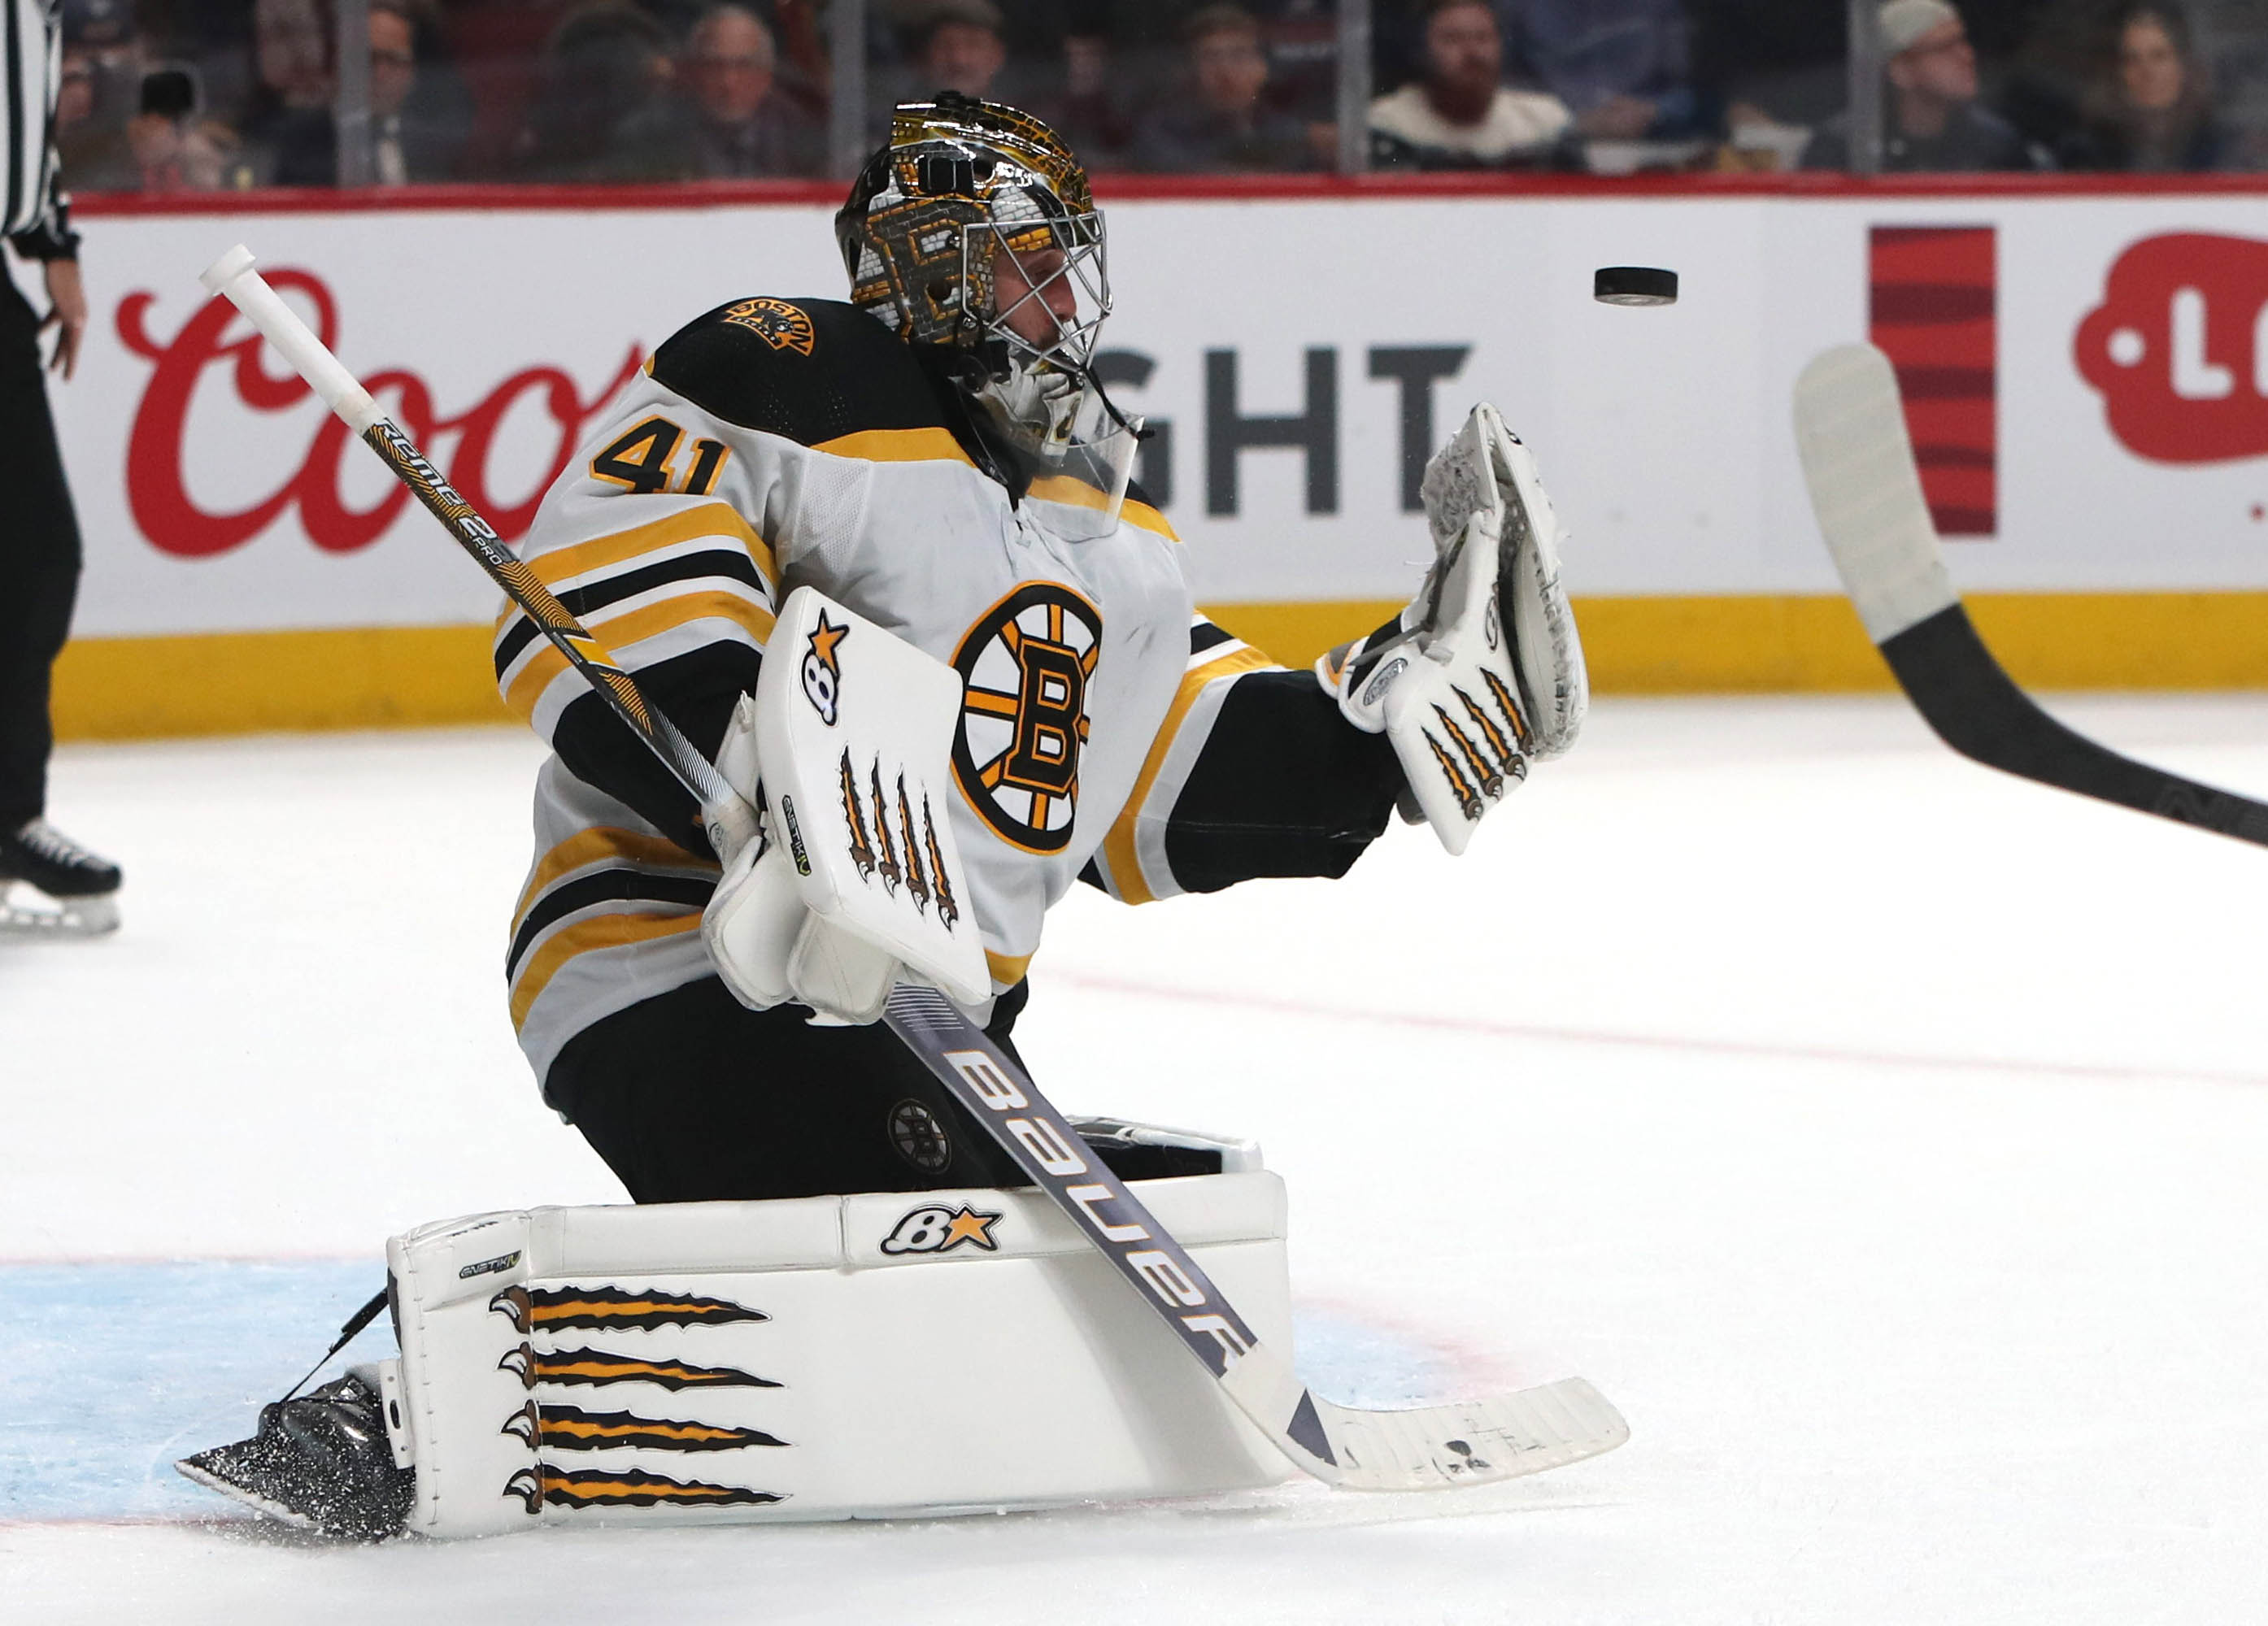 Jaroslav Halak records 52nd career NHL shutout